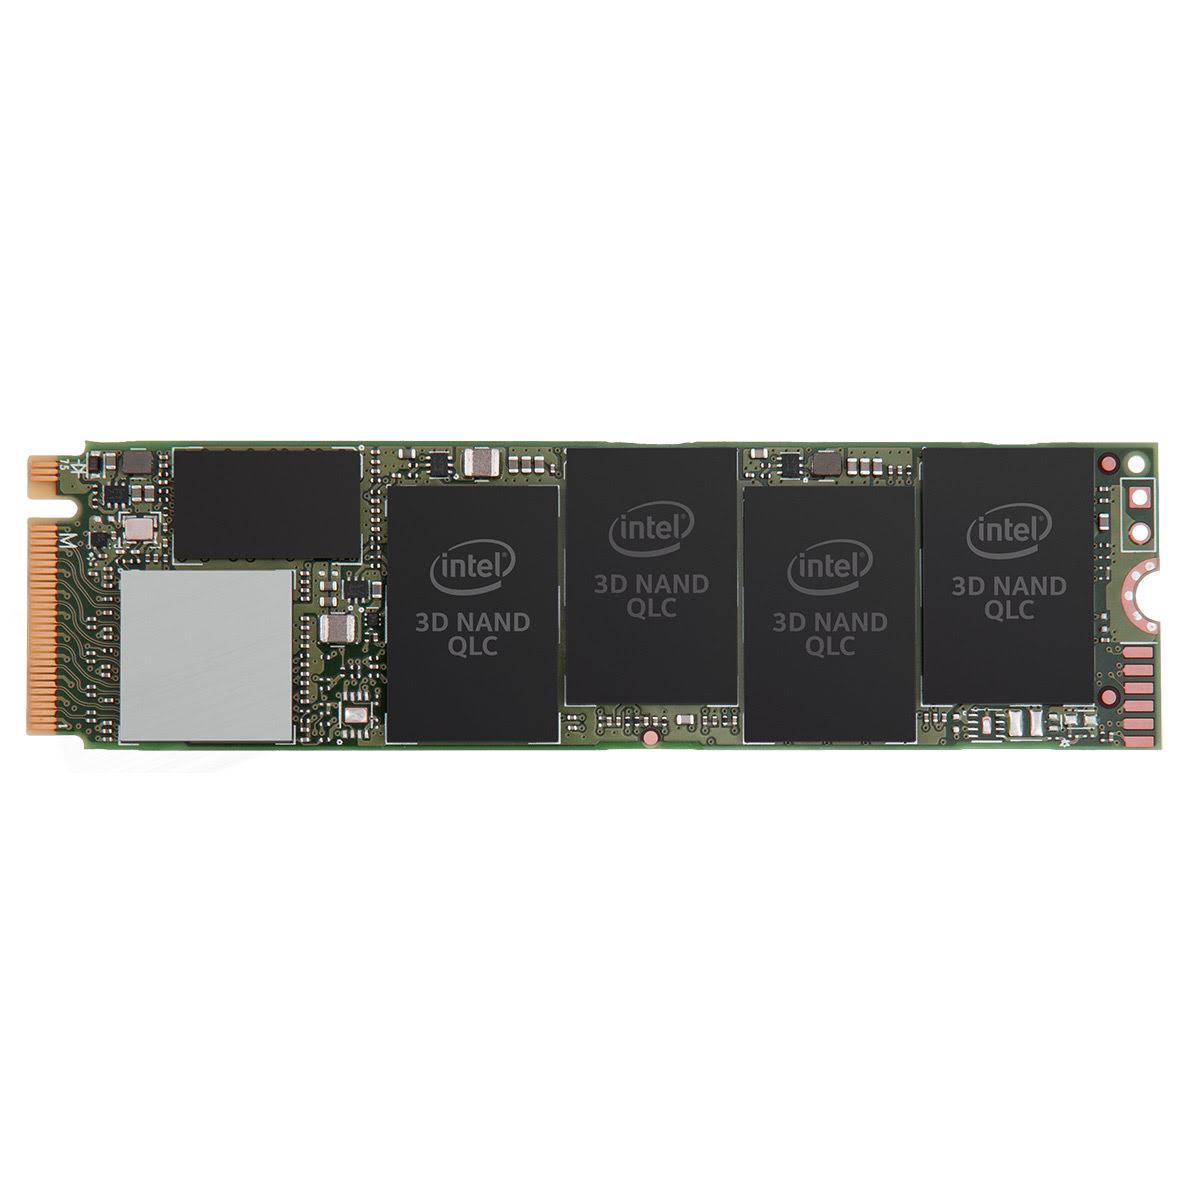 Intel 660P 480-525Go M.2 - Disque SSD Intel - Cybertek.fr - 3